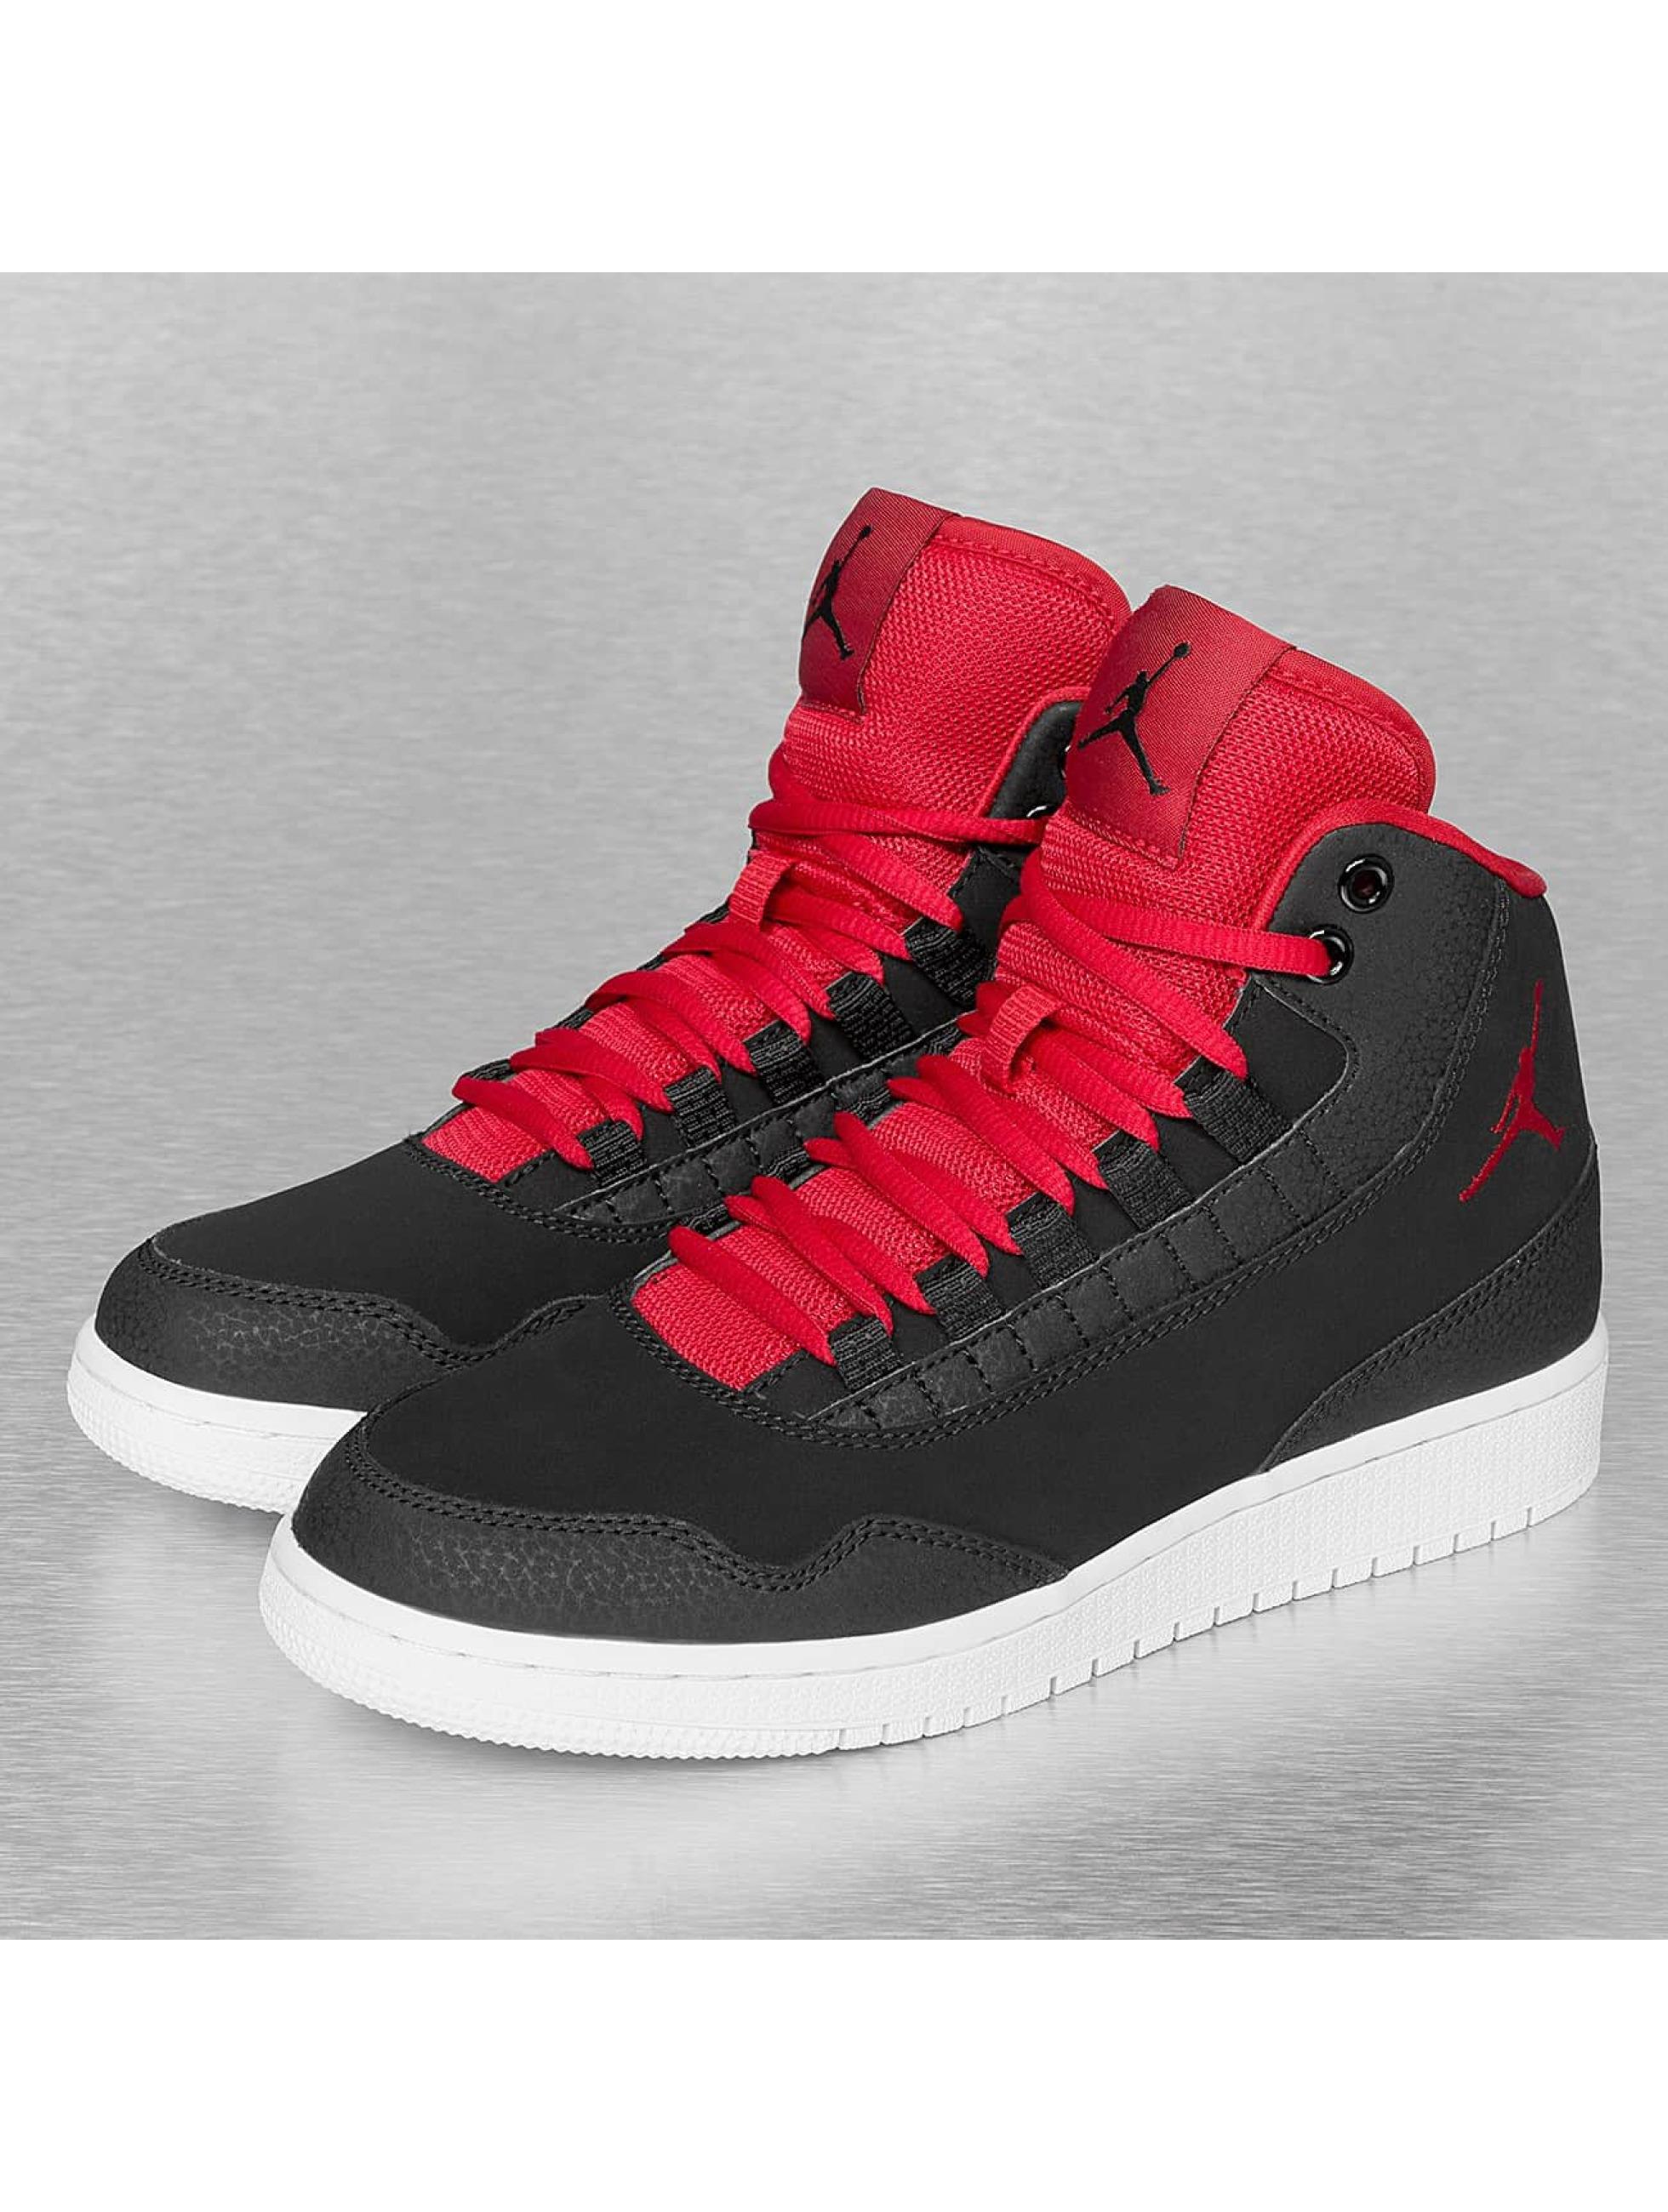 Jordan Schuhe Rot Schwarz